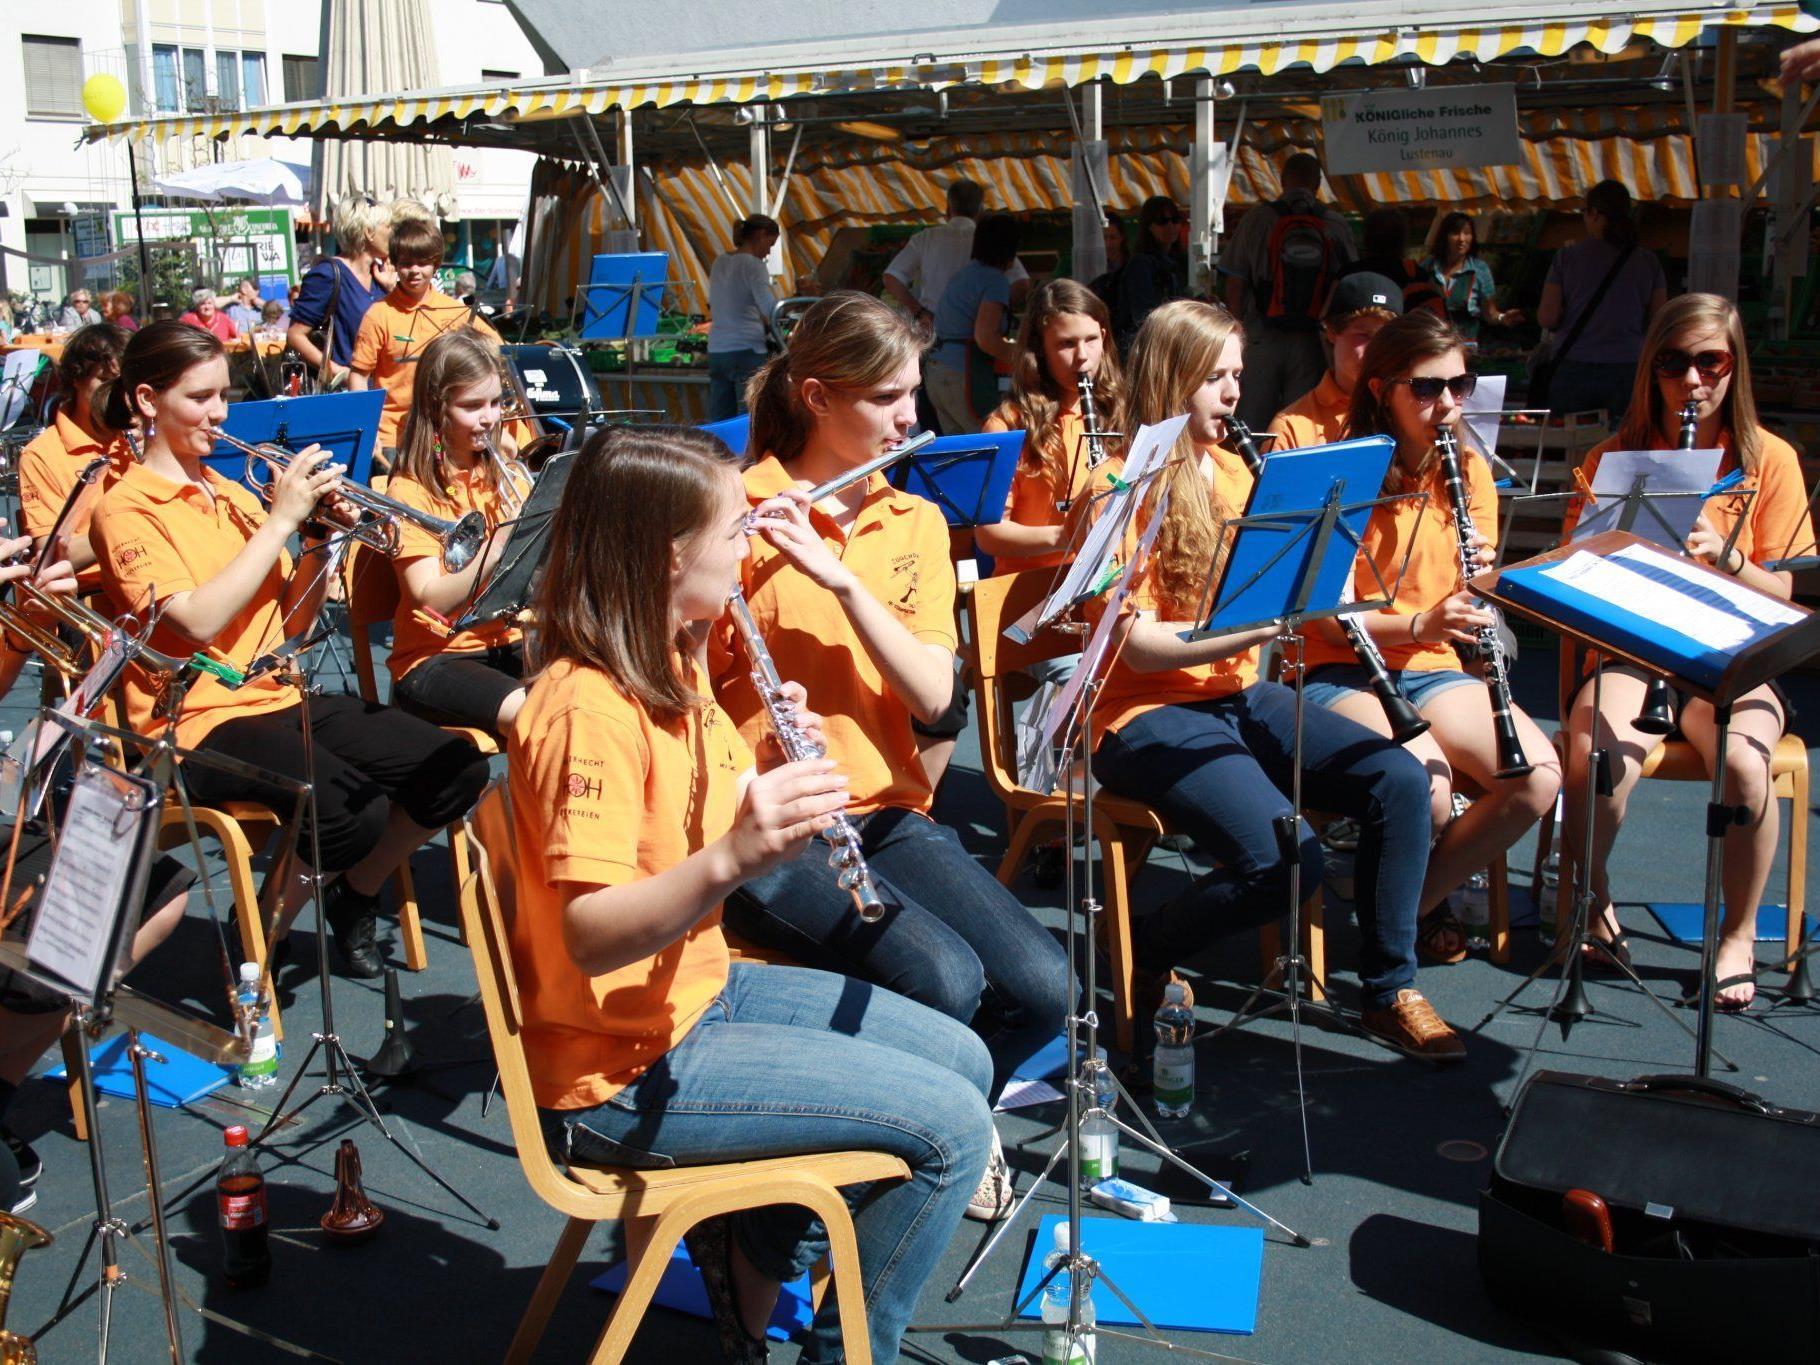 Flotte Melodien präsentierte die Jugendmusik des MV Concordia am Pfingstsamstag.